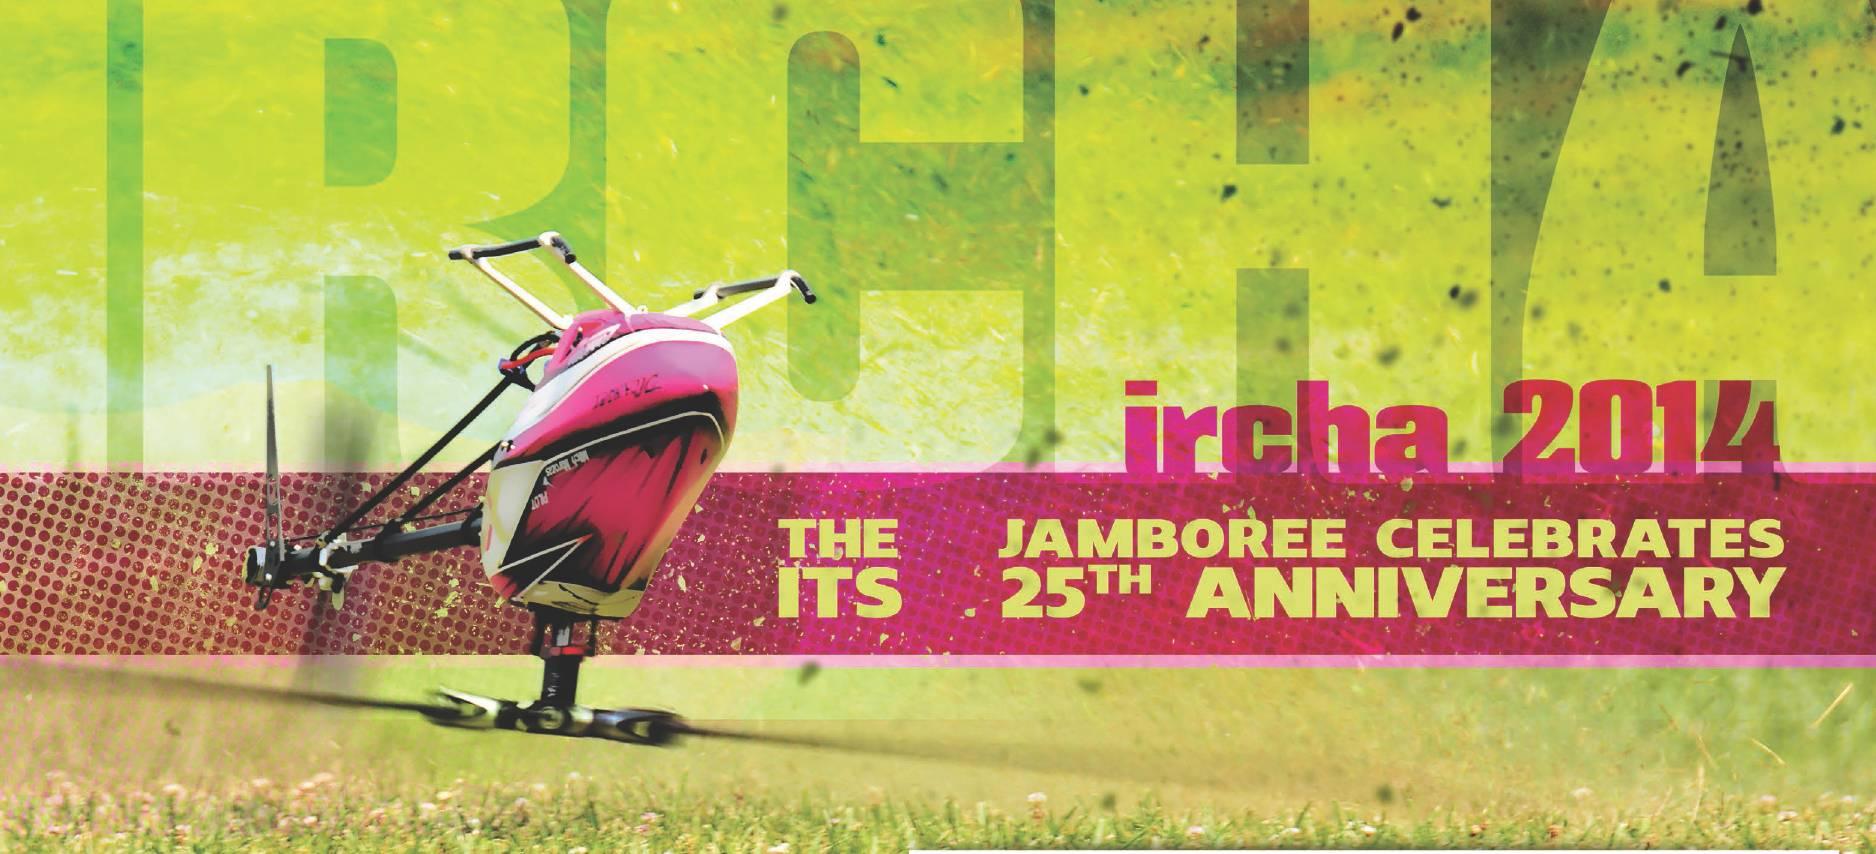 Model Aviation - December 2014 - ircha 2014 THE JAMBOREE CELEBRATES